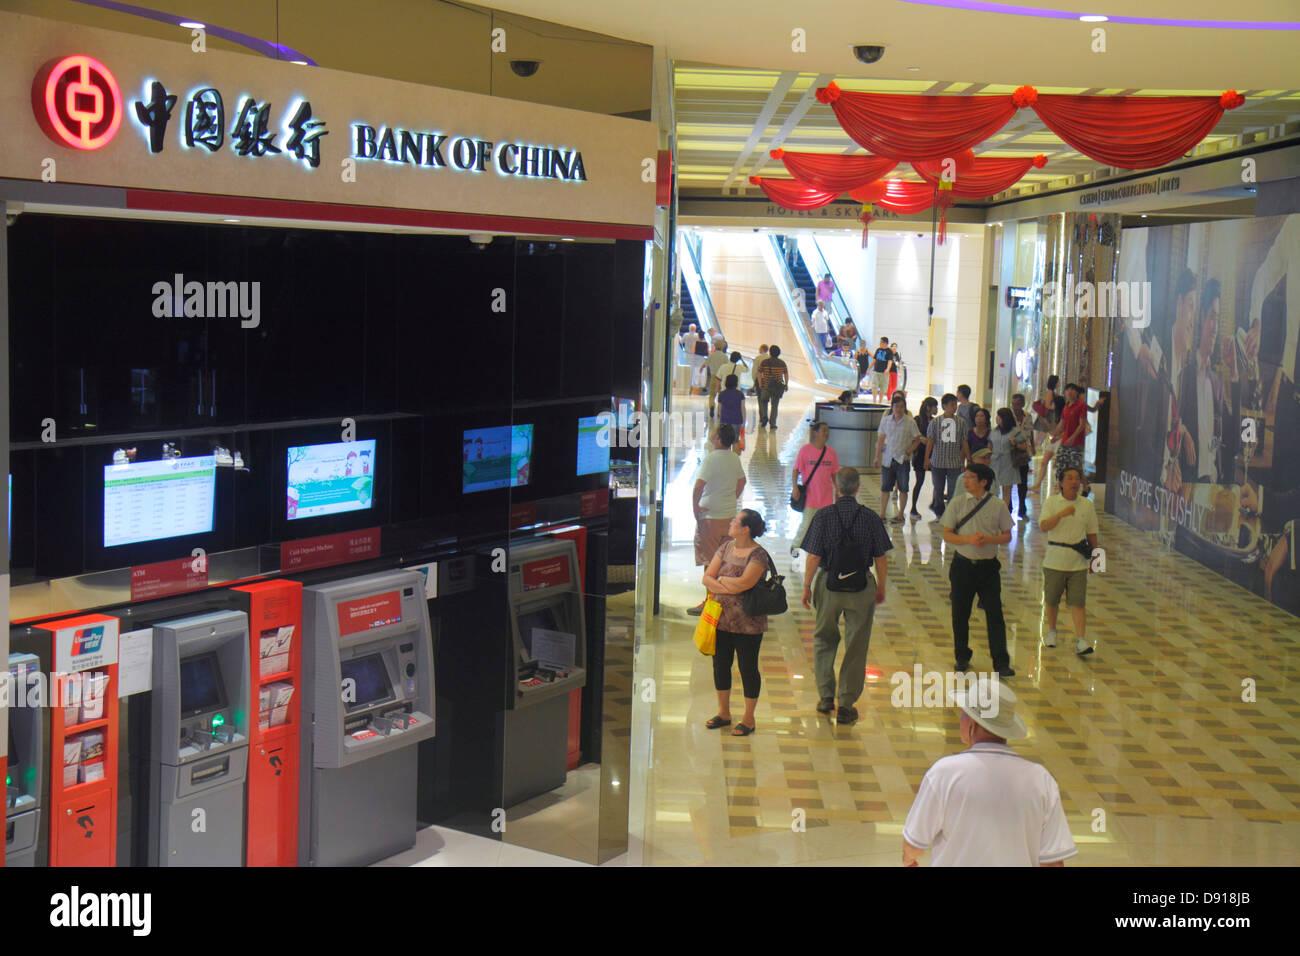 Singapore The Shoppes at Marina Bay Sands shops shopping Bank of China Chinese hanzi characters ATM automated teller - Stock Image